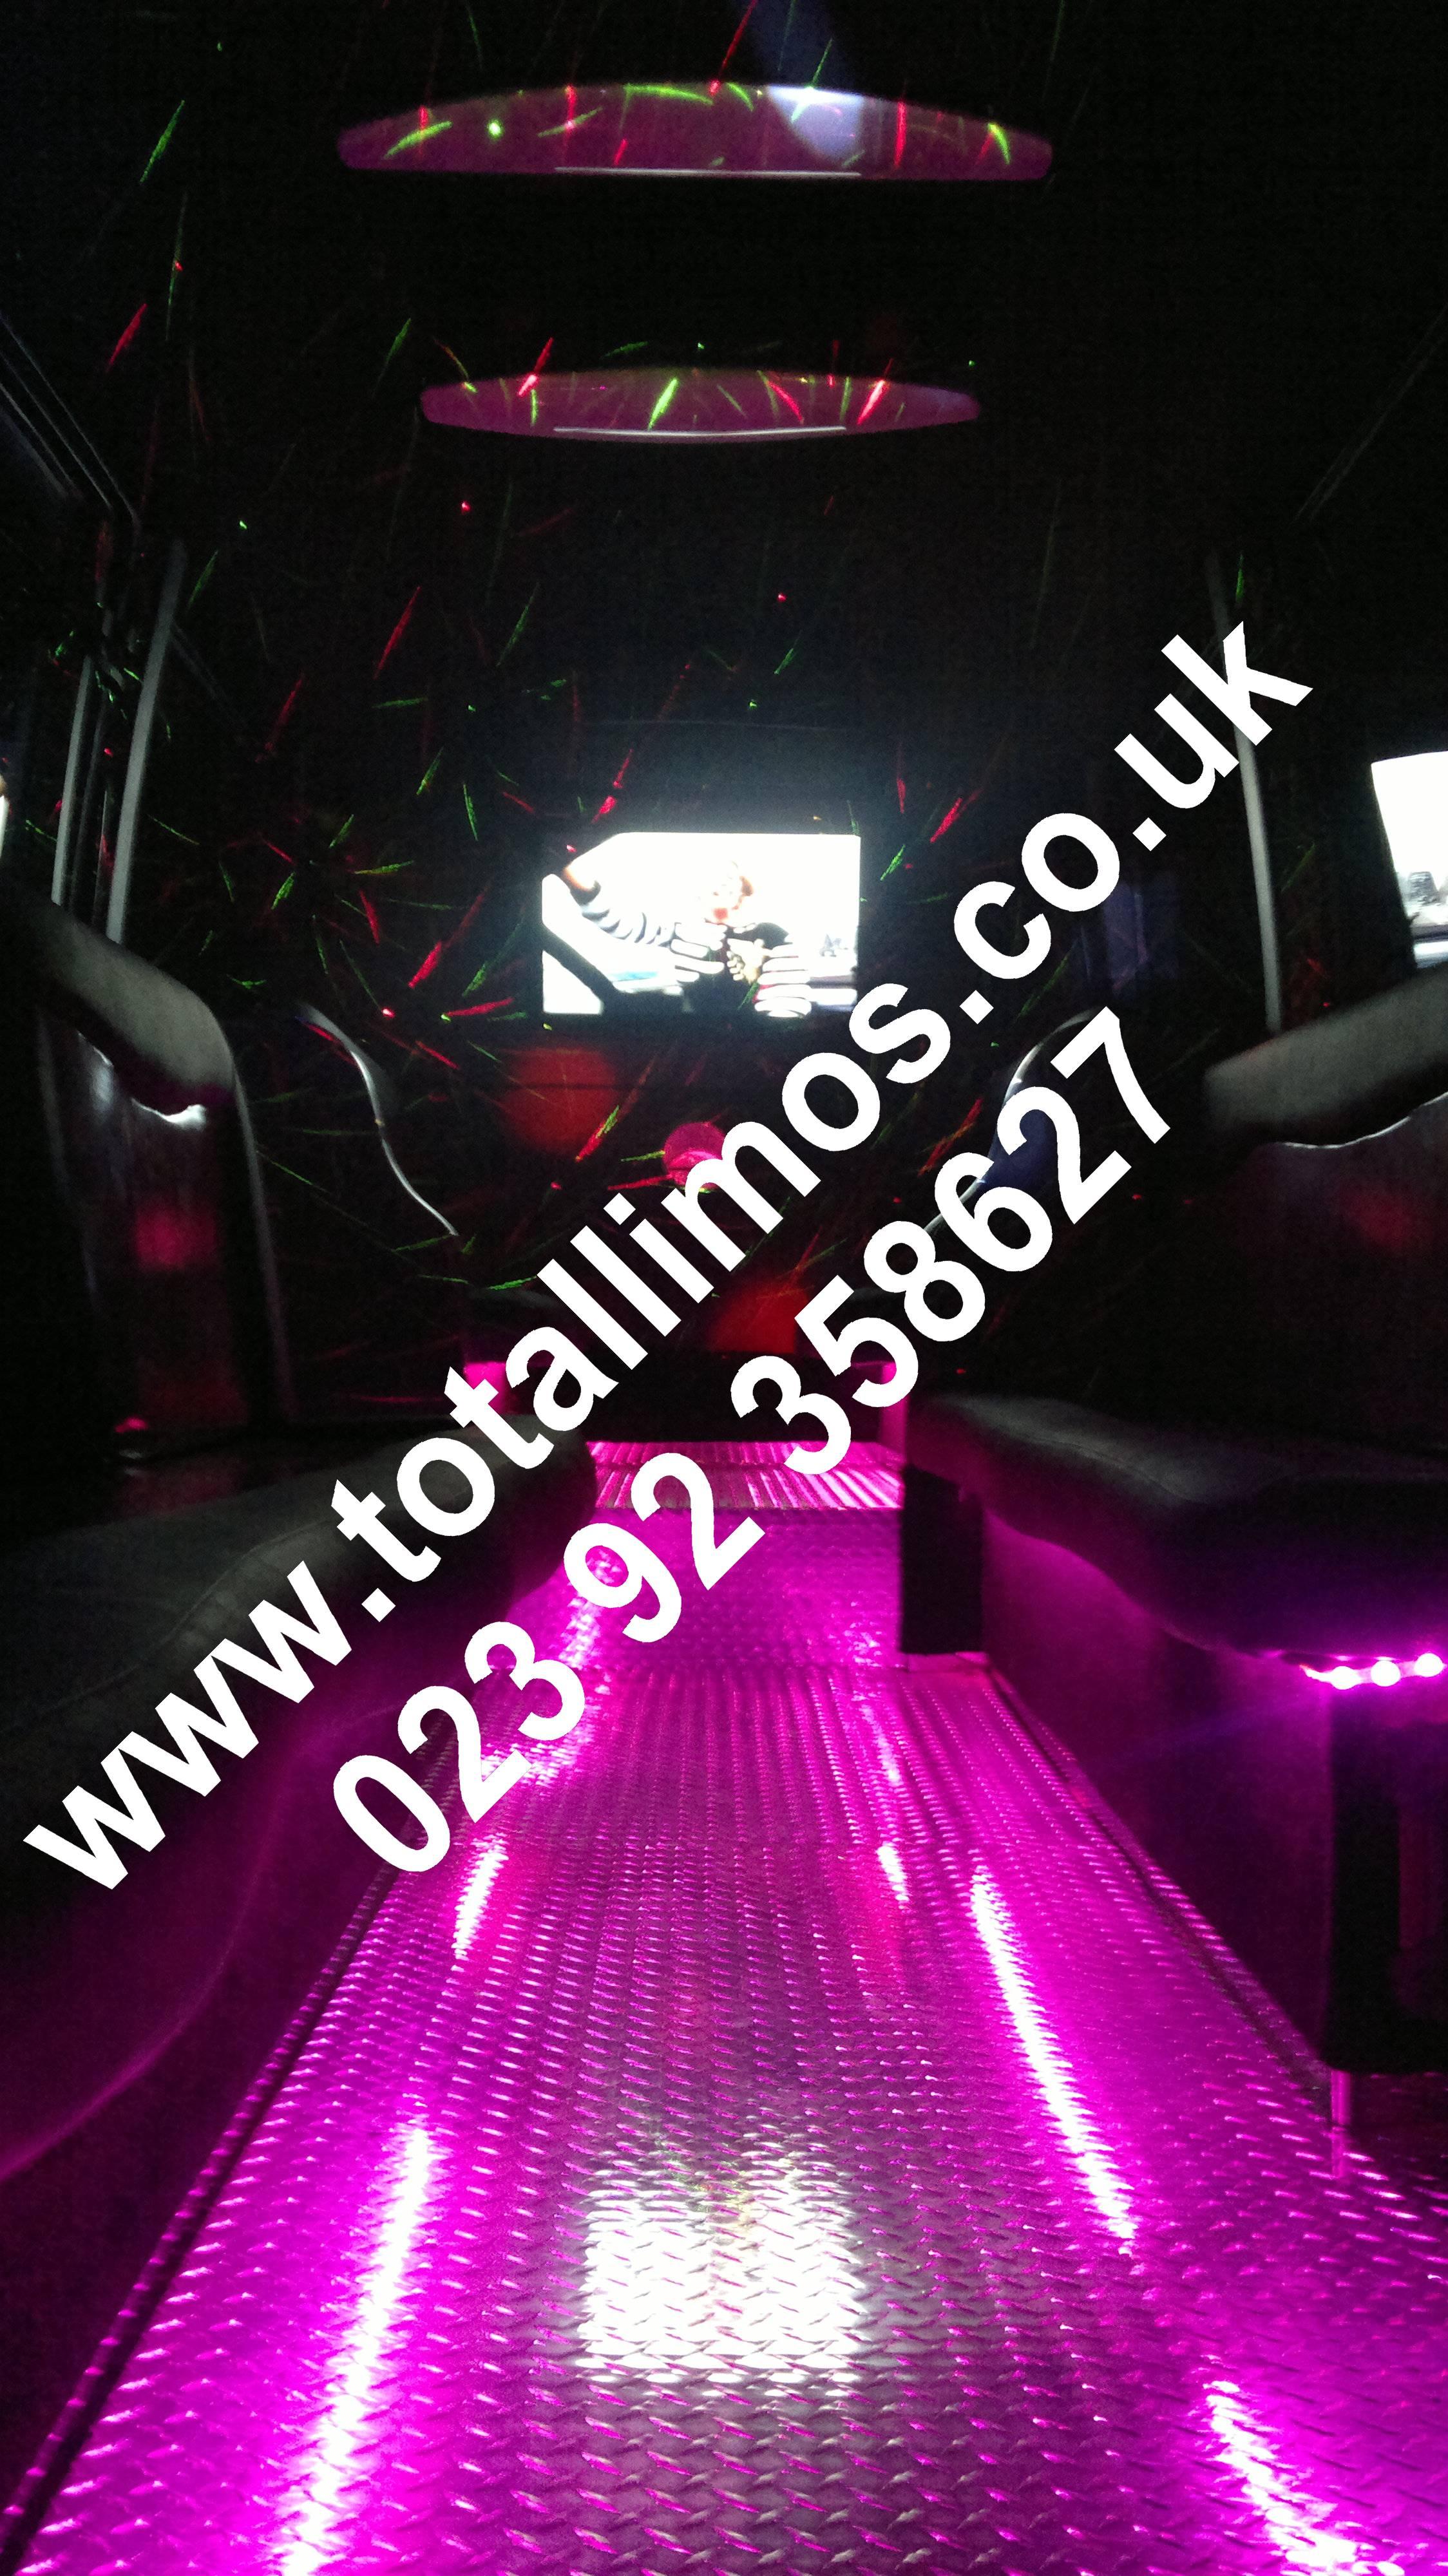 webassets/pink-pink-limo-bus.jpg